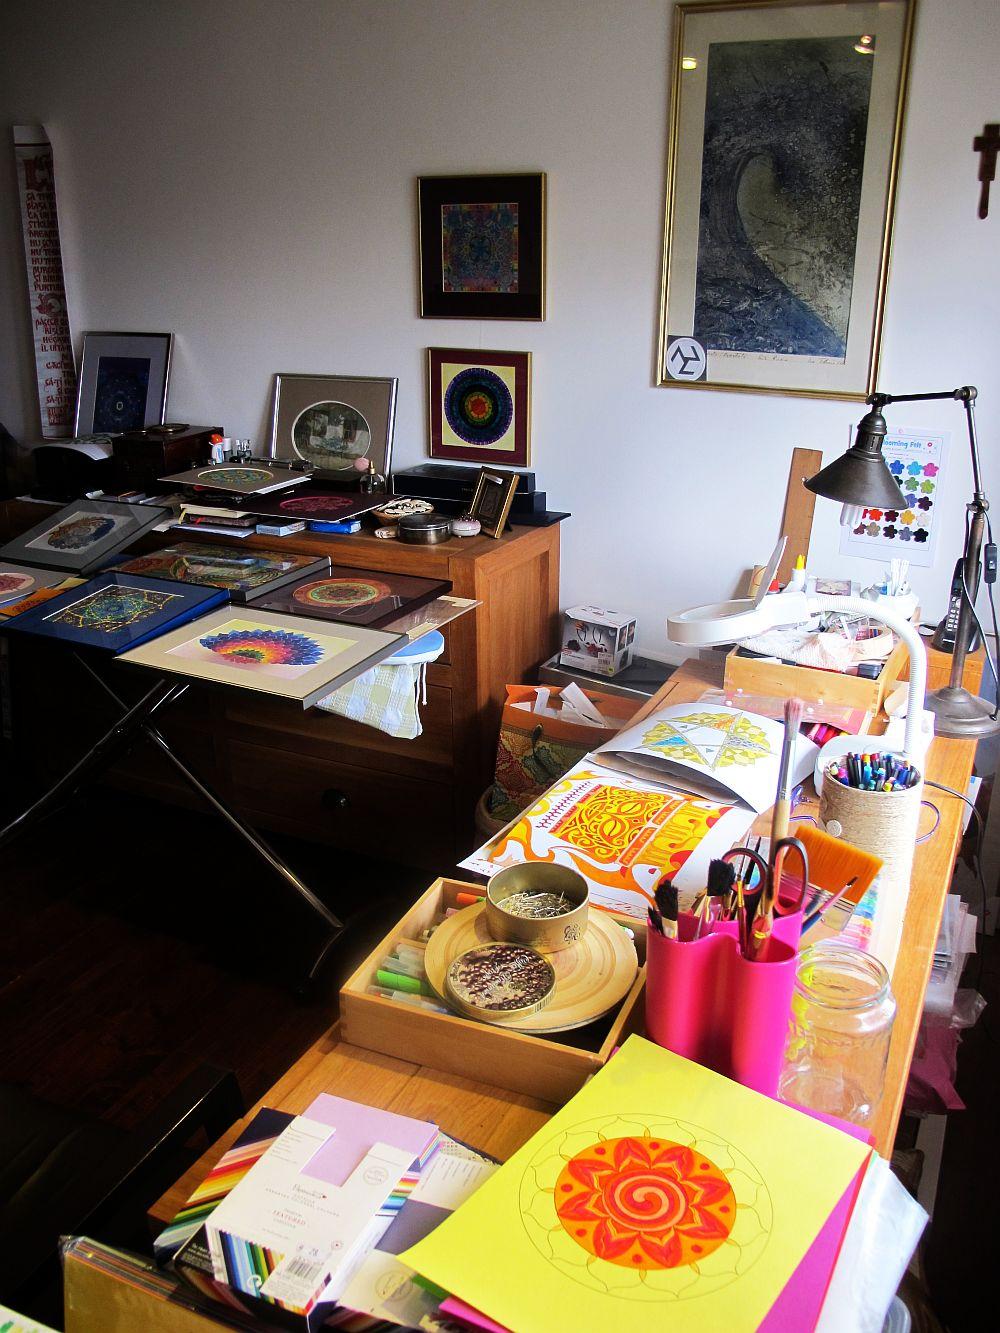 adelaparvu.com about Ioana Dominte artist (9)